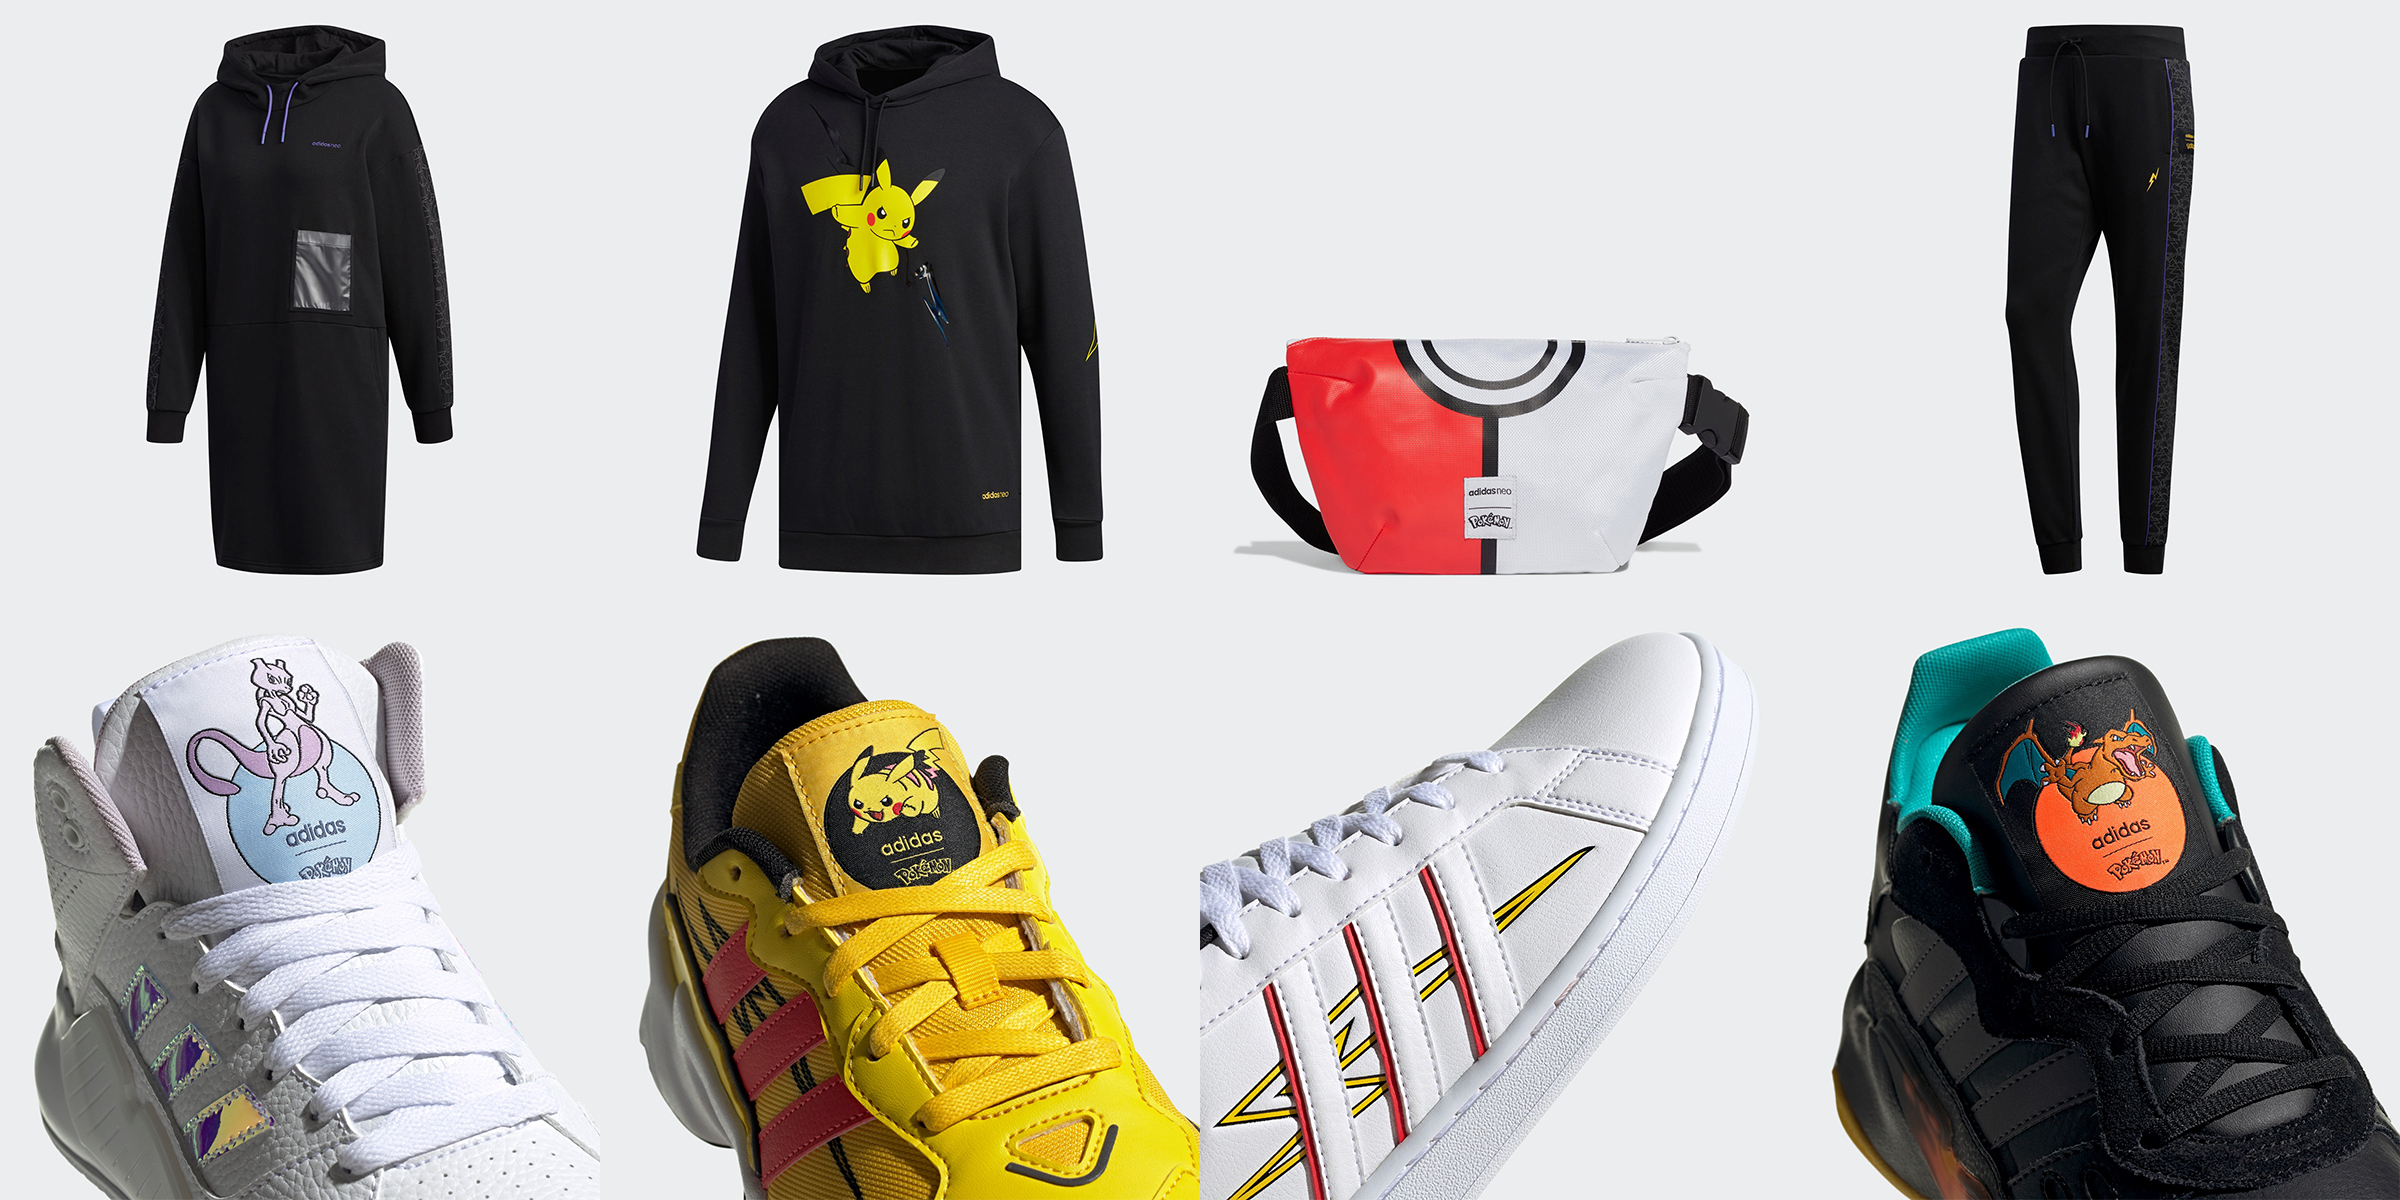 adidas寶可夢聯名鞋包服飾在台開賣,超潮皮